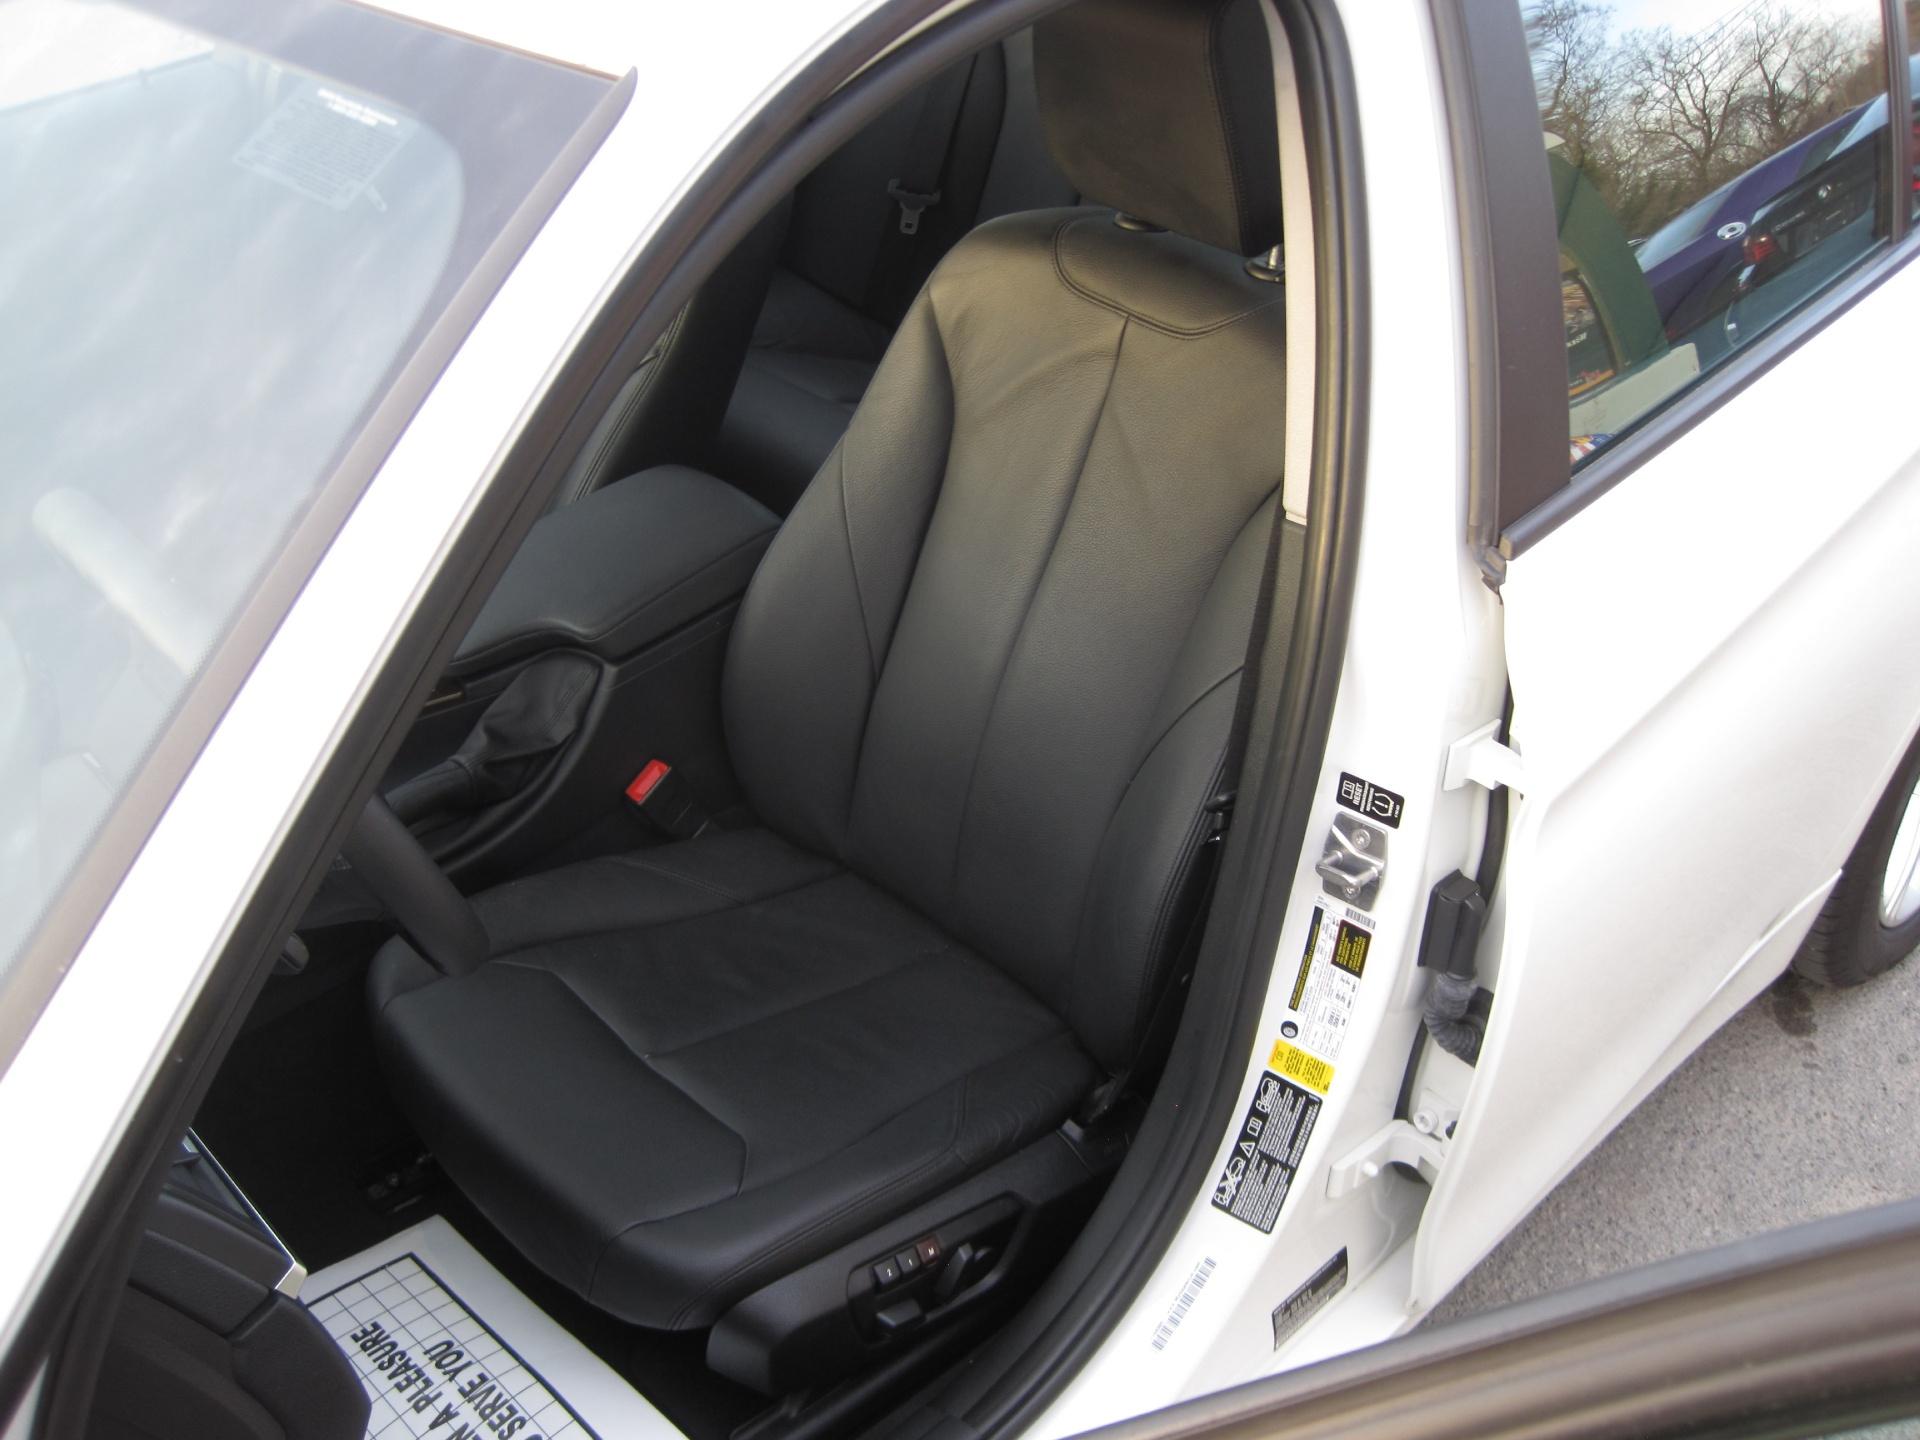 BMW Albany Ny >> 2013 BMW 3 Series 328i xDrive AWD,NAVIGATION,PREMIUM PKG,HEATED SEATS Stock # 15056 for sale ...